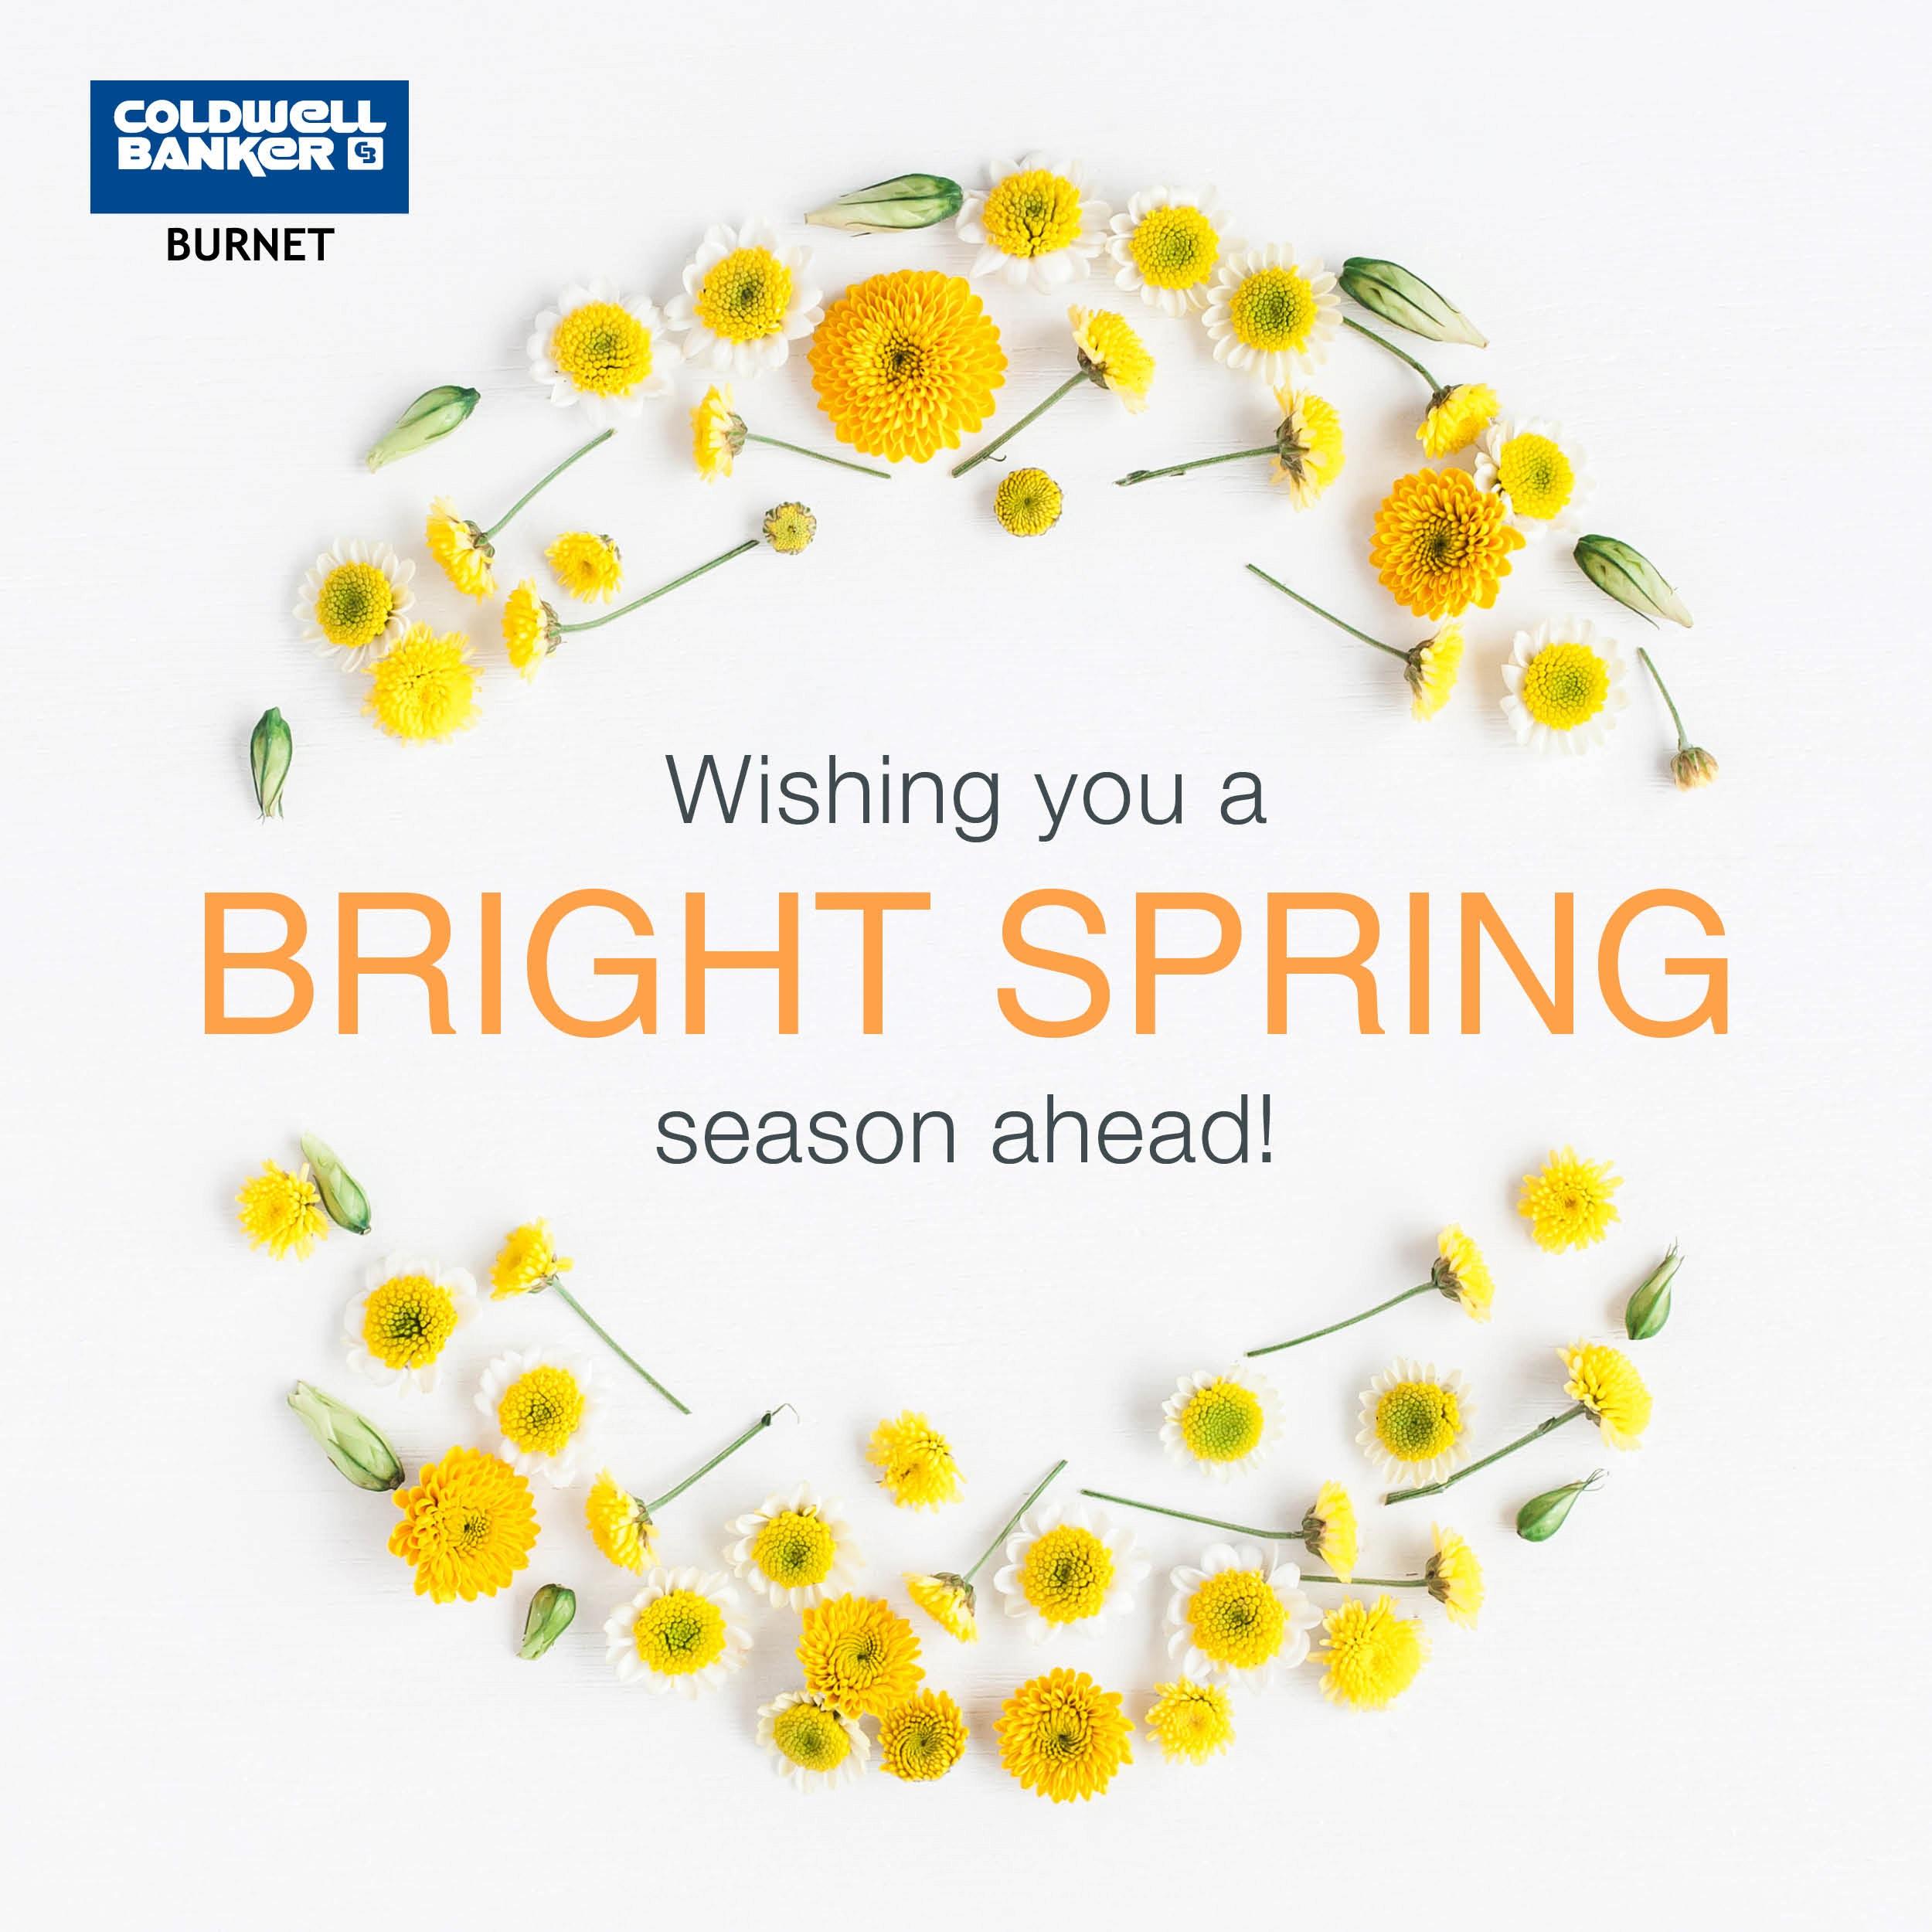 Wishing you a bright spring season ahead